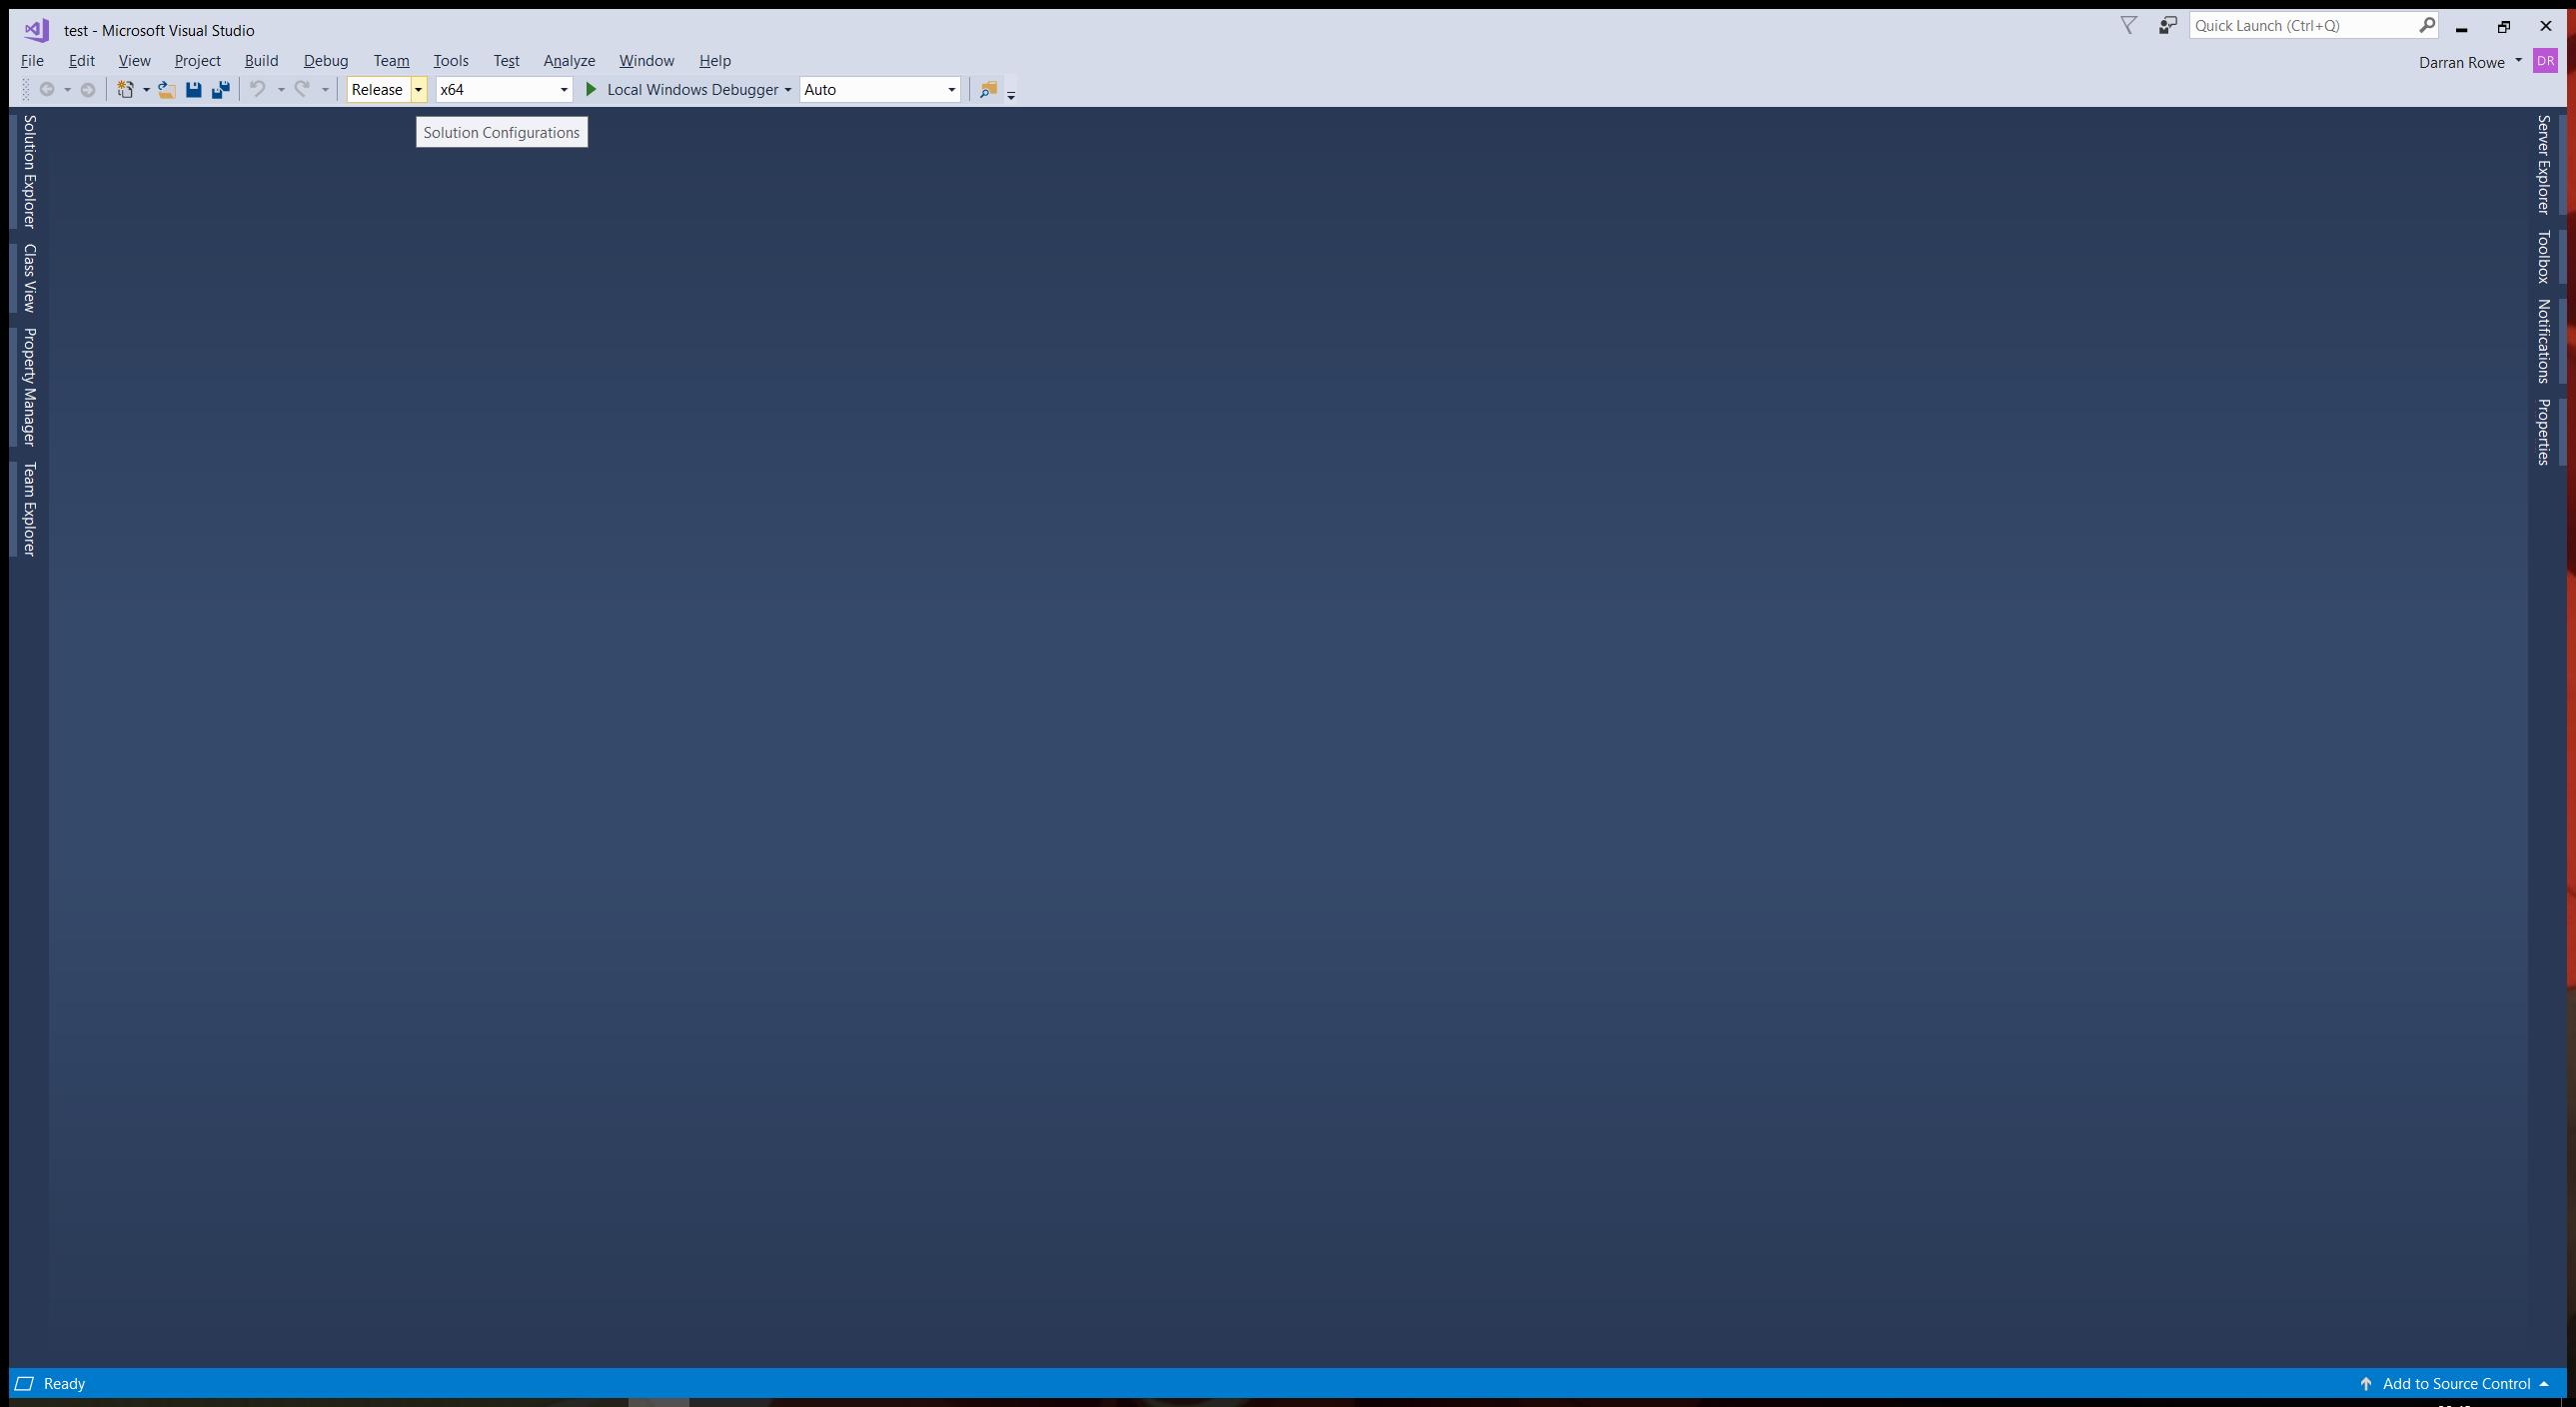 msvcp140d.dll microsoft download